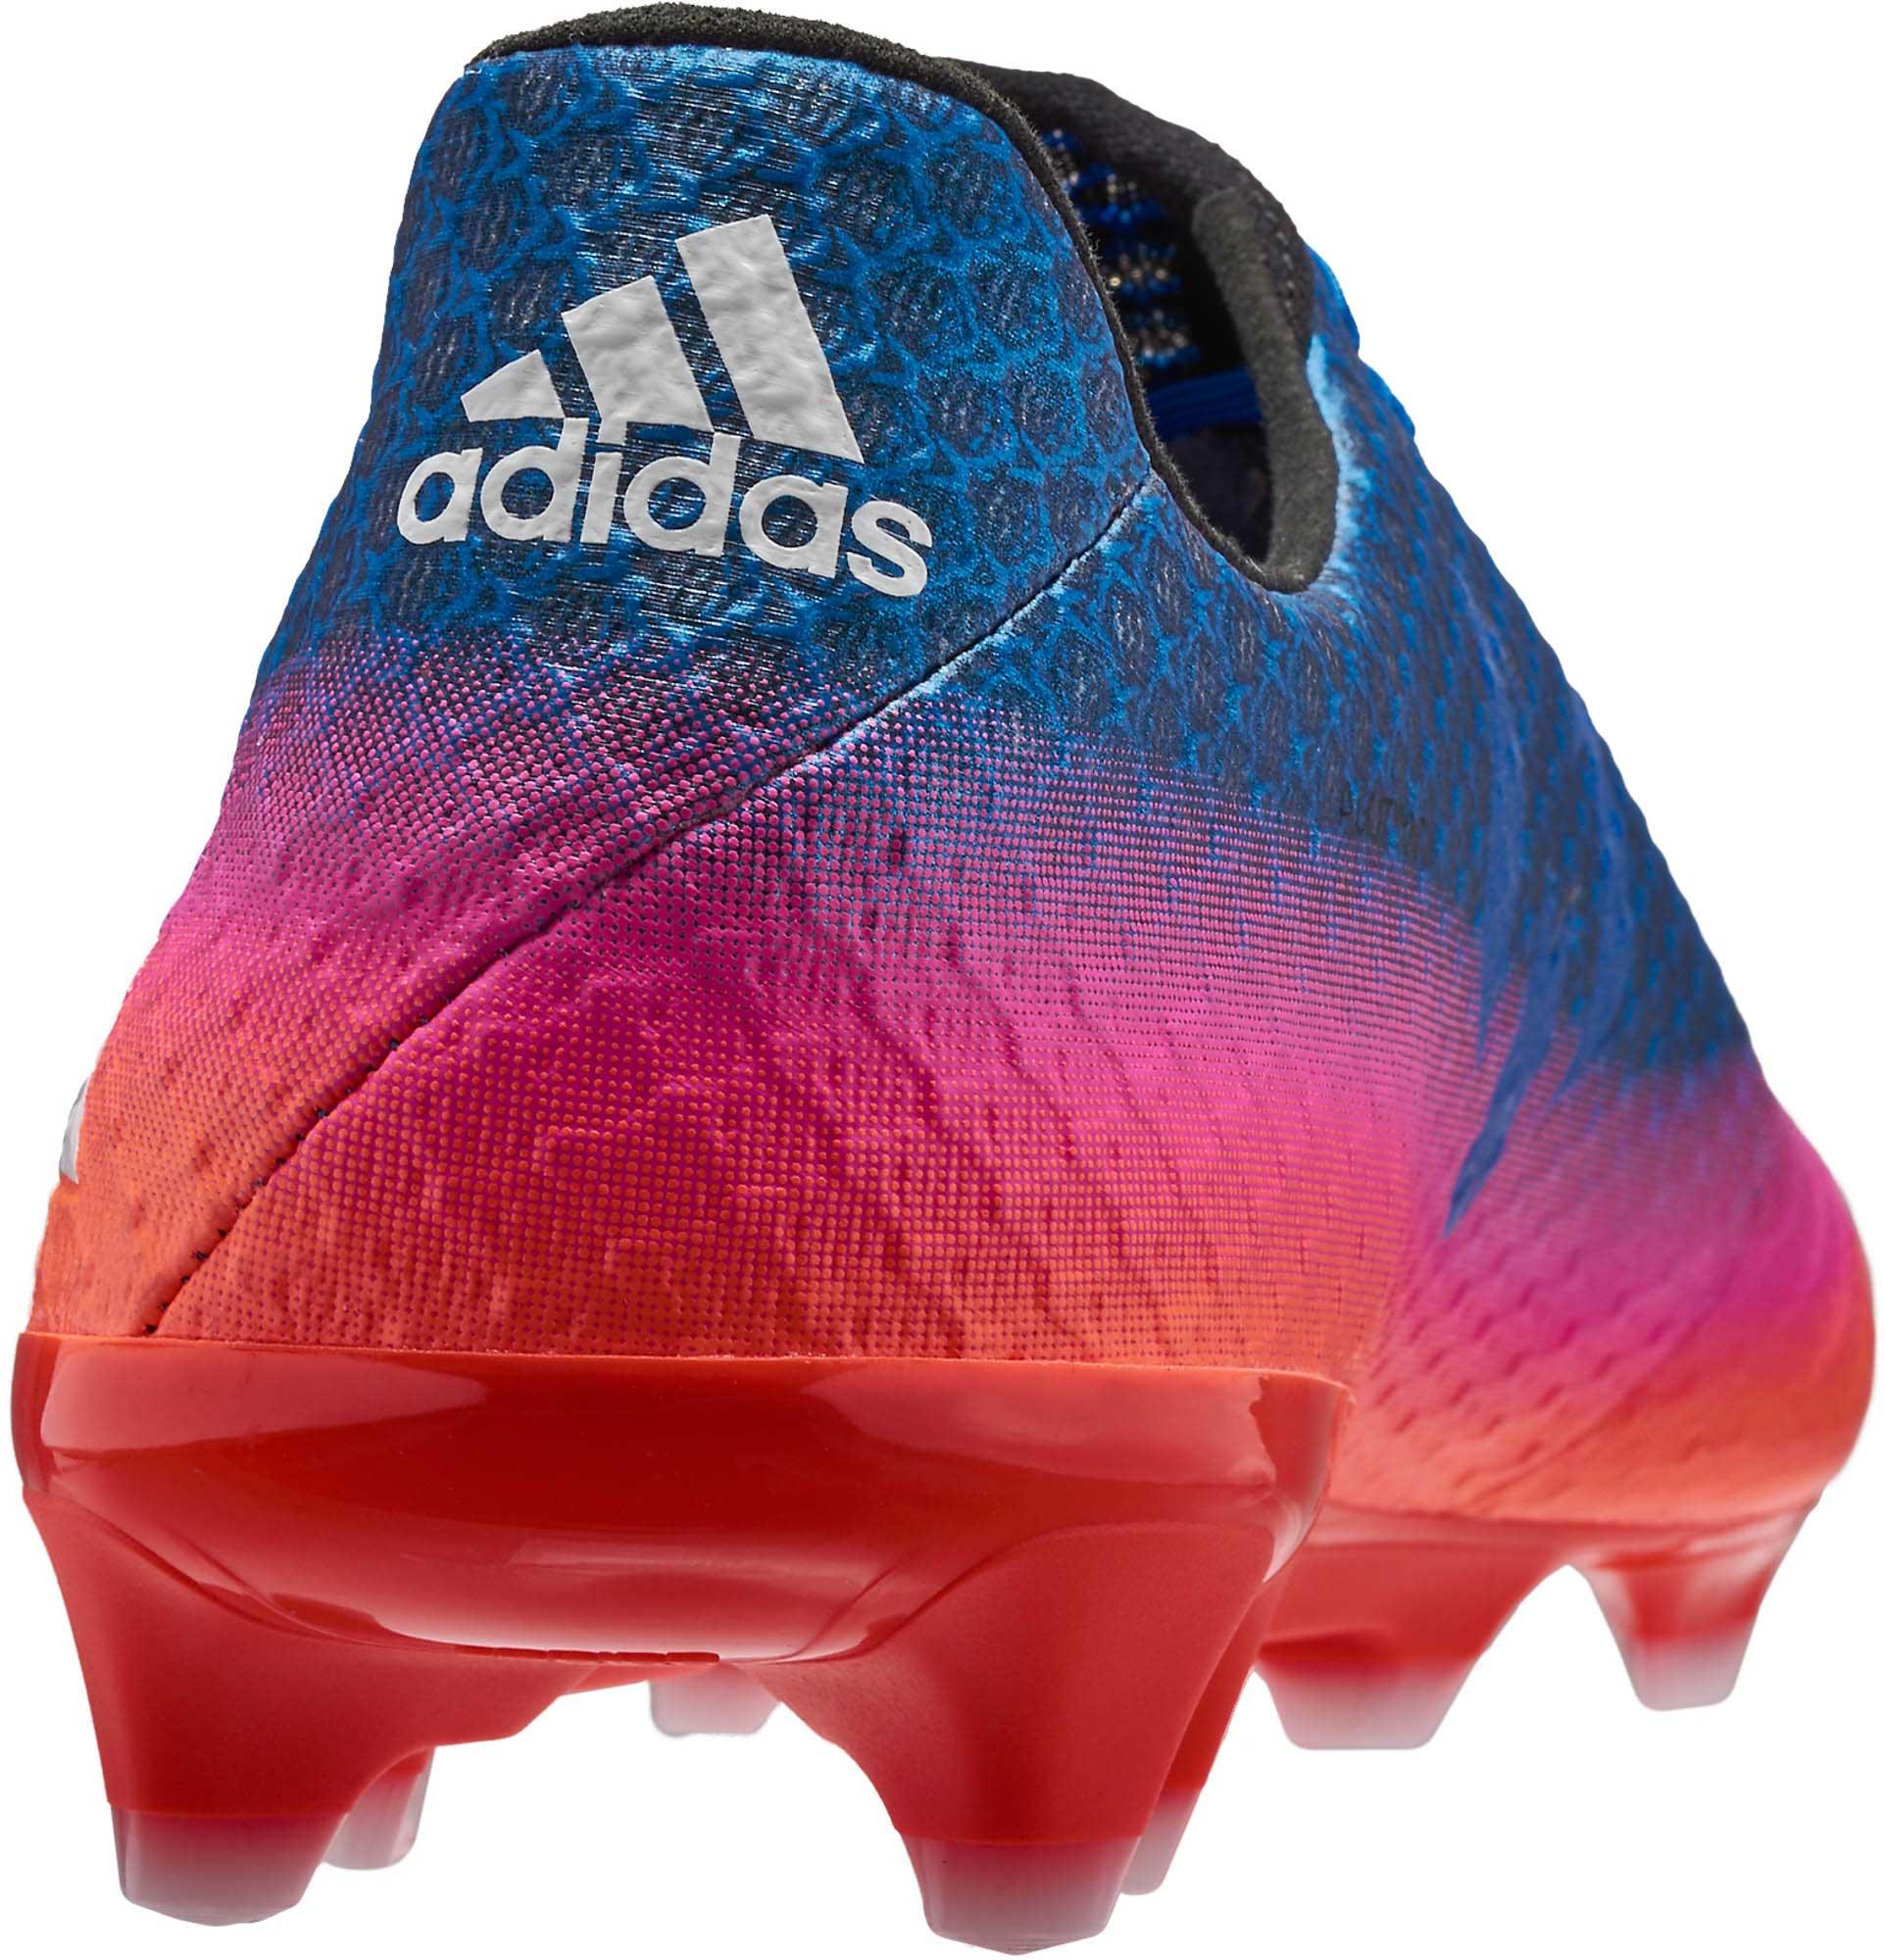 11ad6bdec7a adidas Messi 16.1 FG Cleats- adidas Messi Soccer Cleats